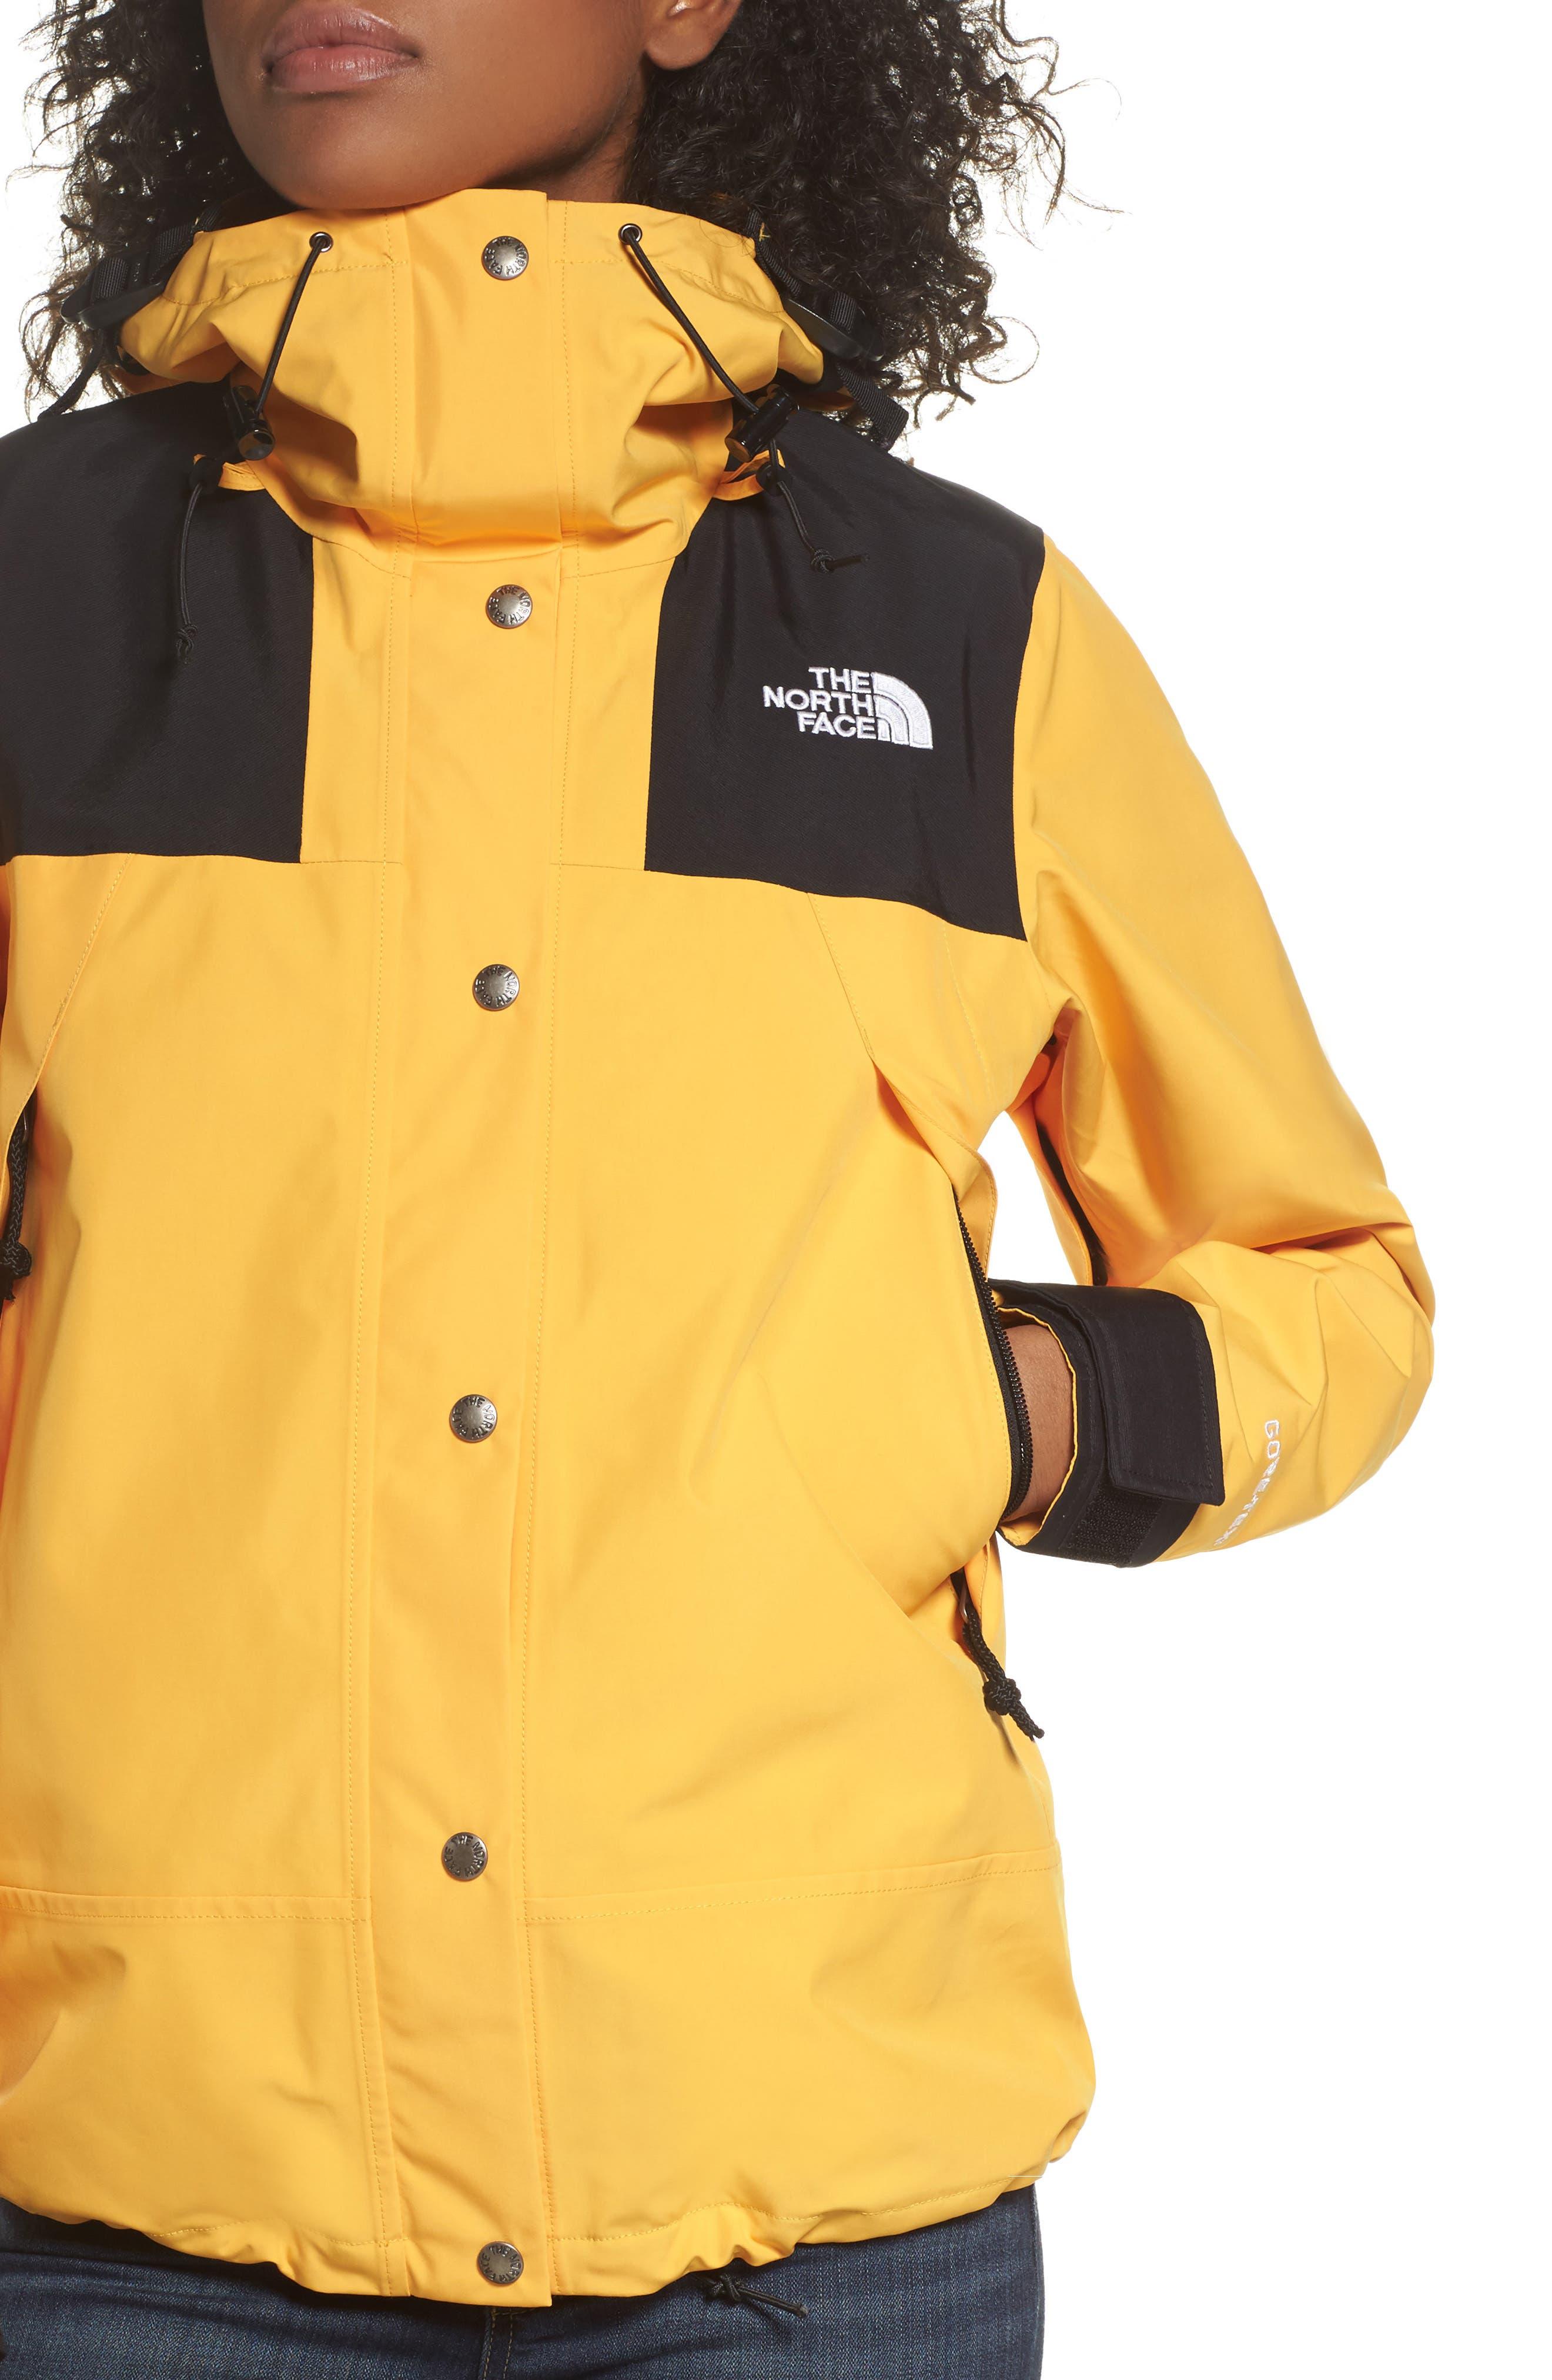 1990 Mountain Jacket,                             Alternate thumbnail 4, color,                             Tnf Yellow